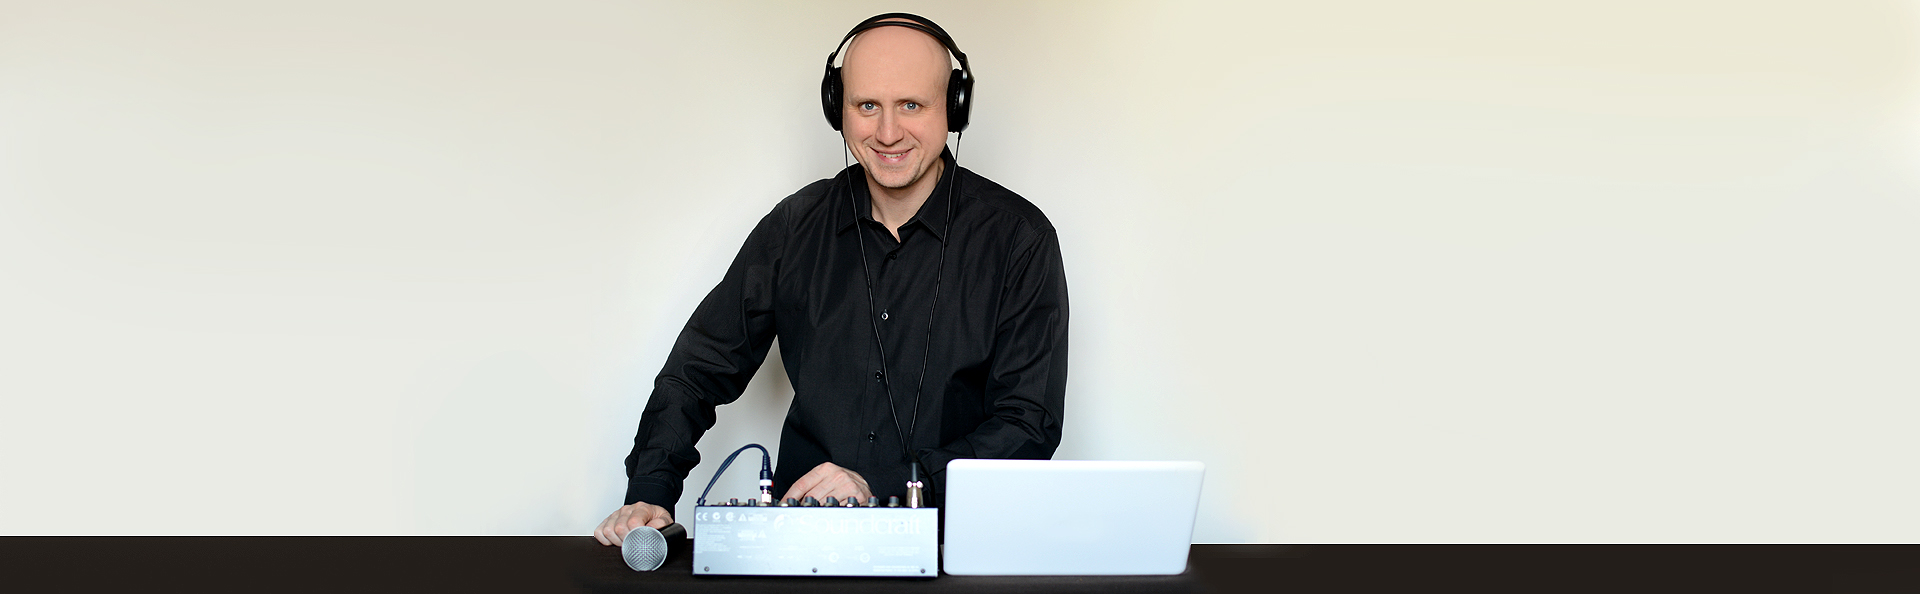 DJ-Jirka-Brezina-svatby-slider